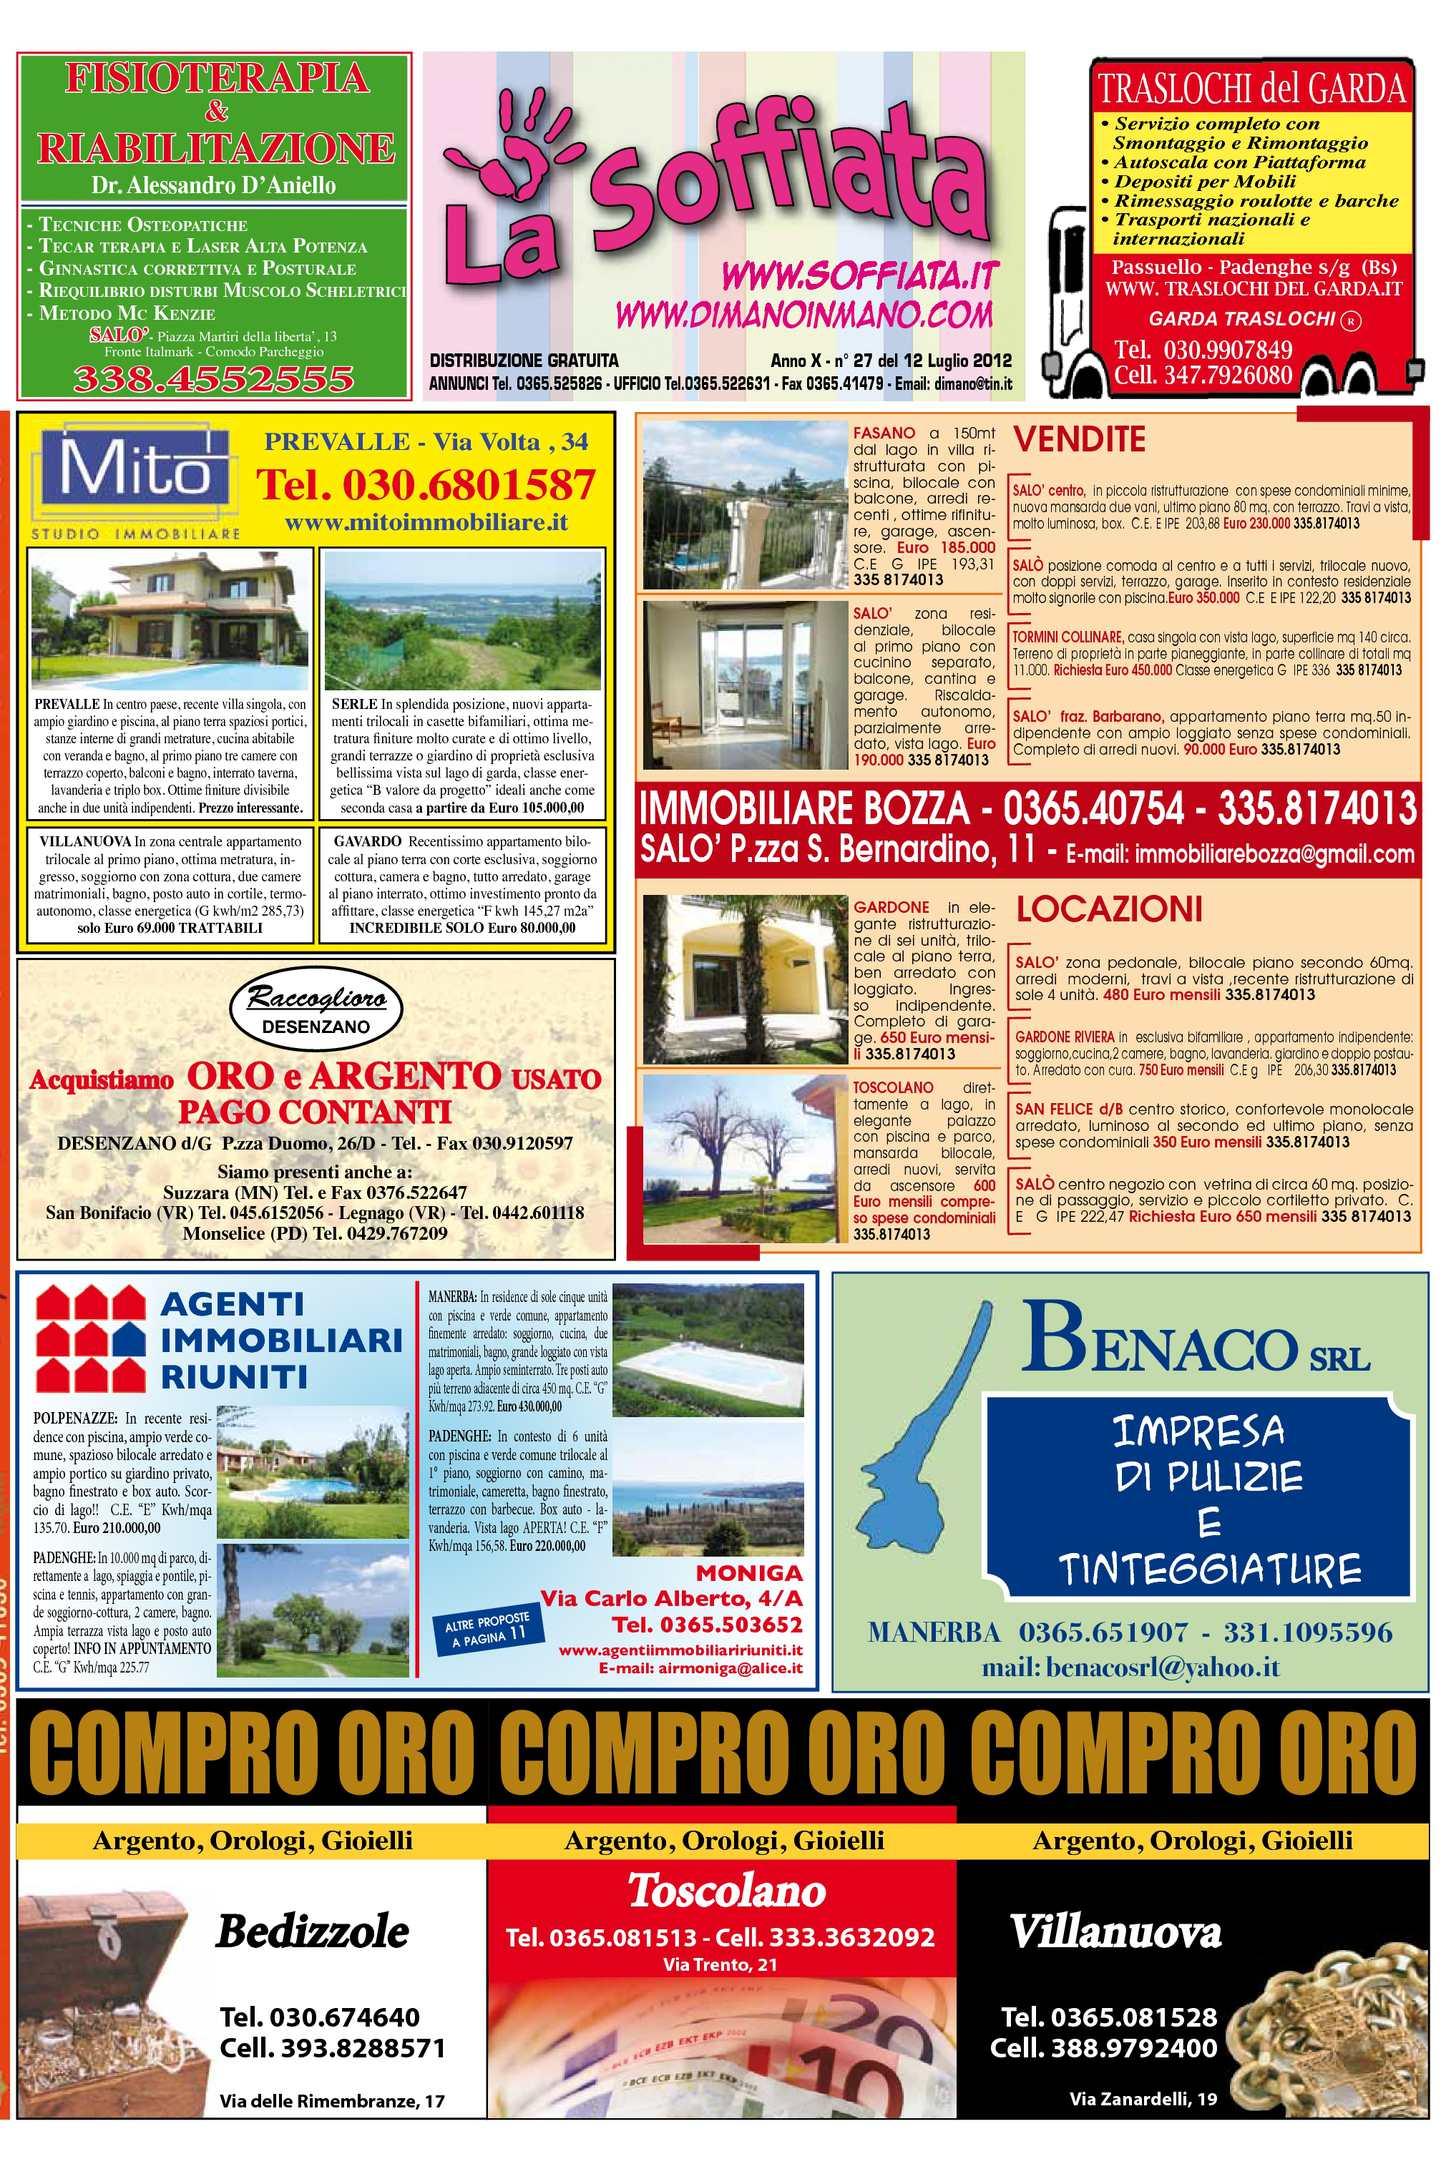 da00f0ae83 Calaméo - La Soffiata 12-07-2012